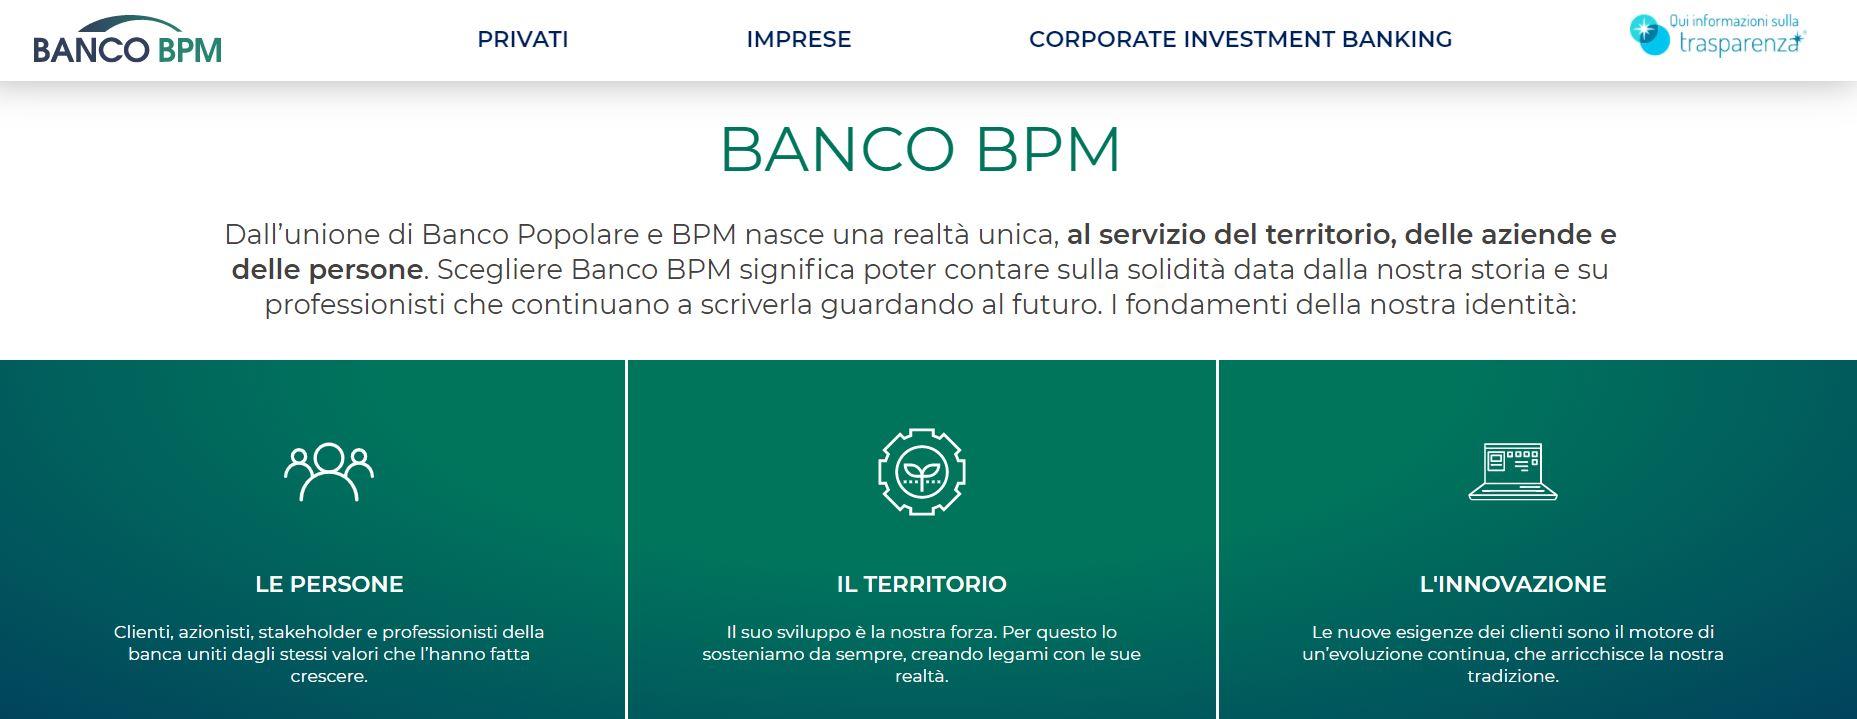 banco bpm banca italiana